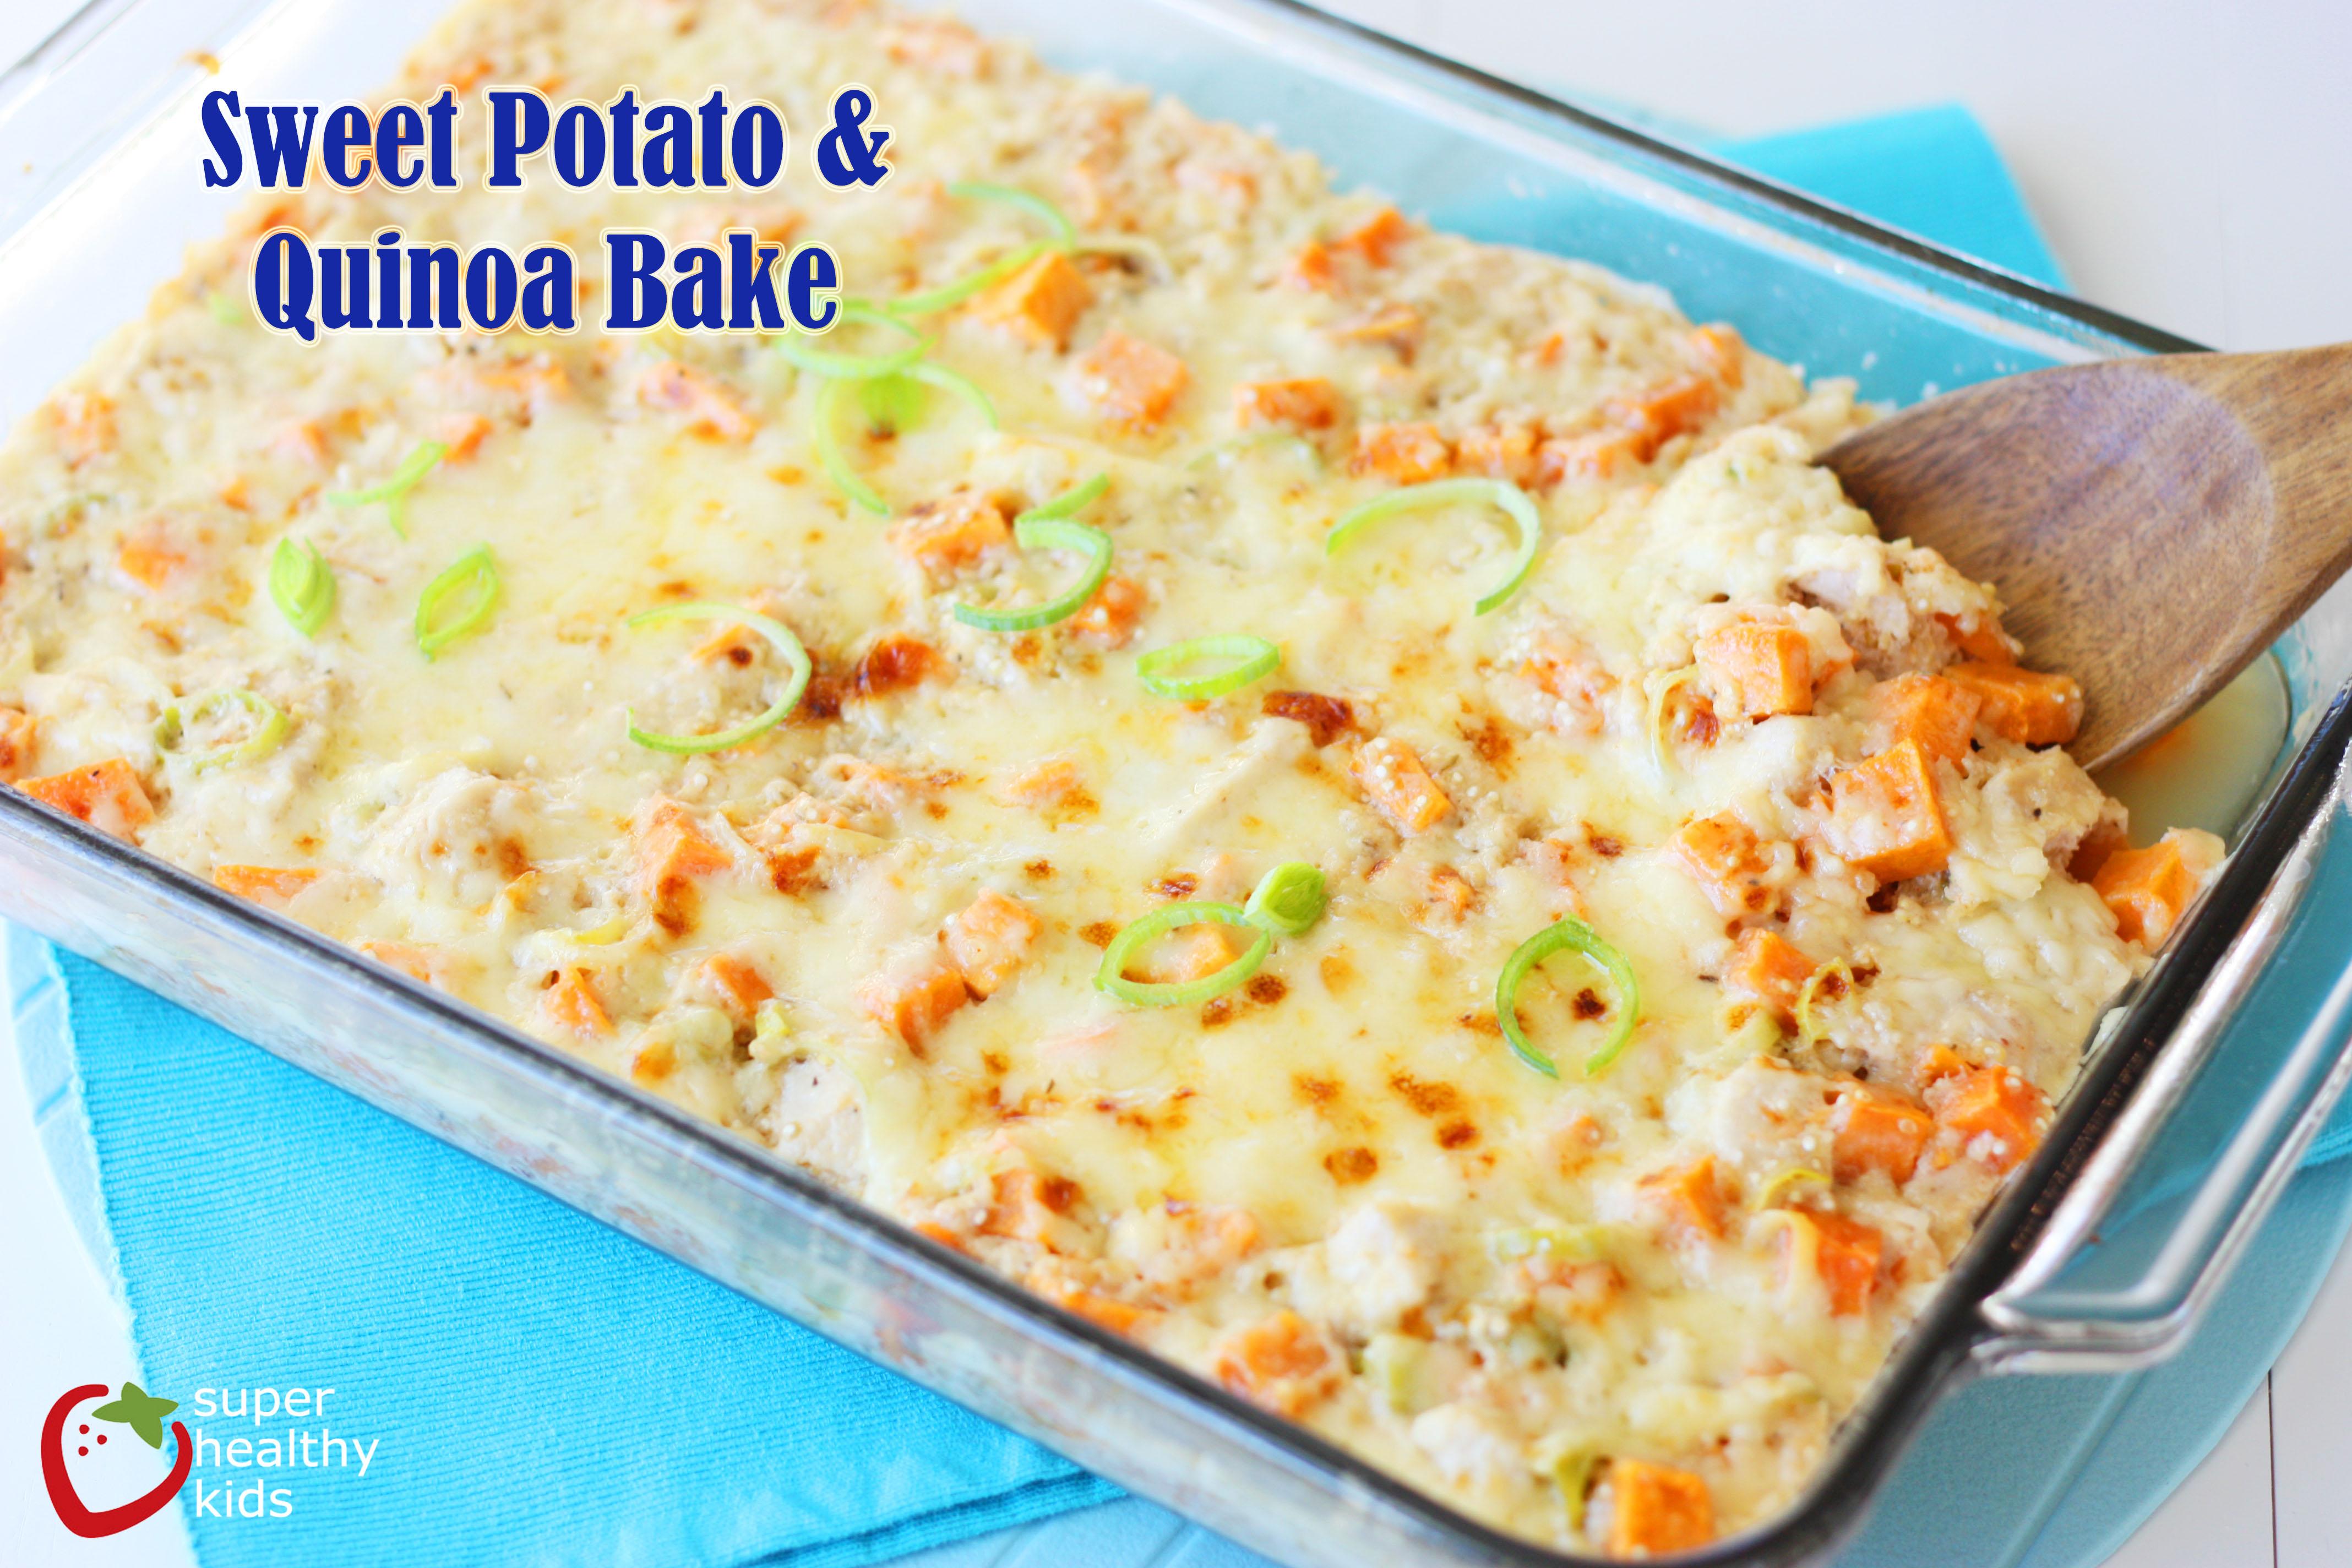 Sweet potato pasta bake recipe